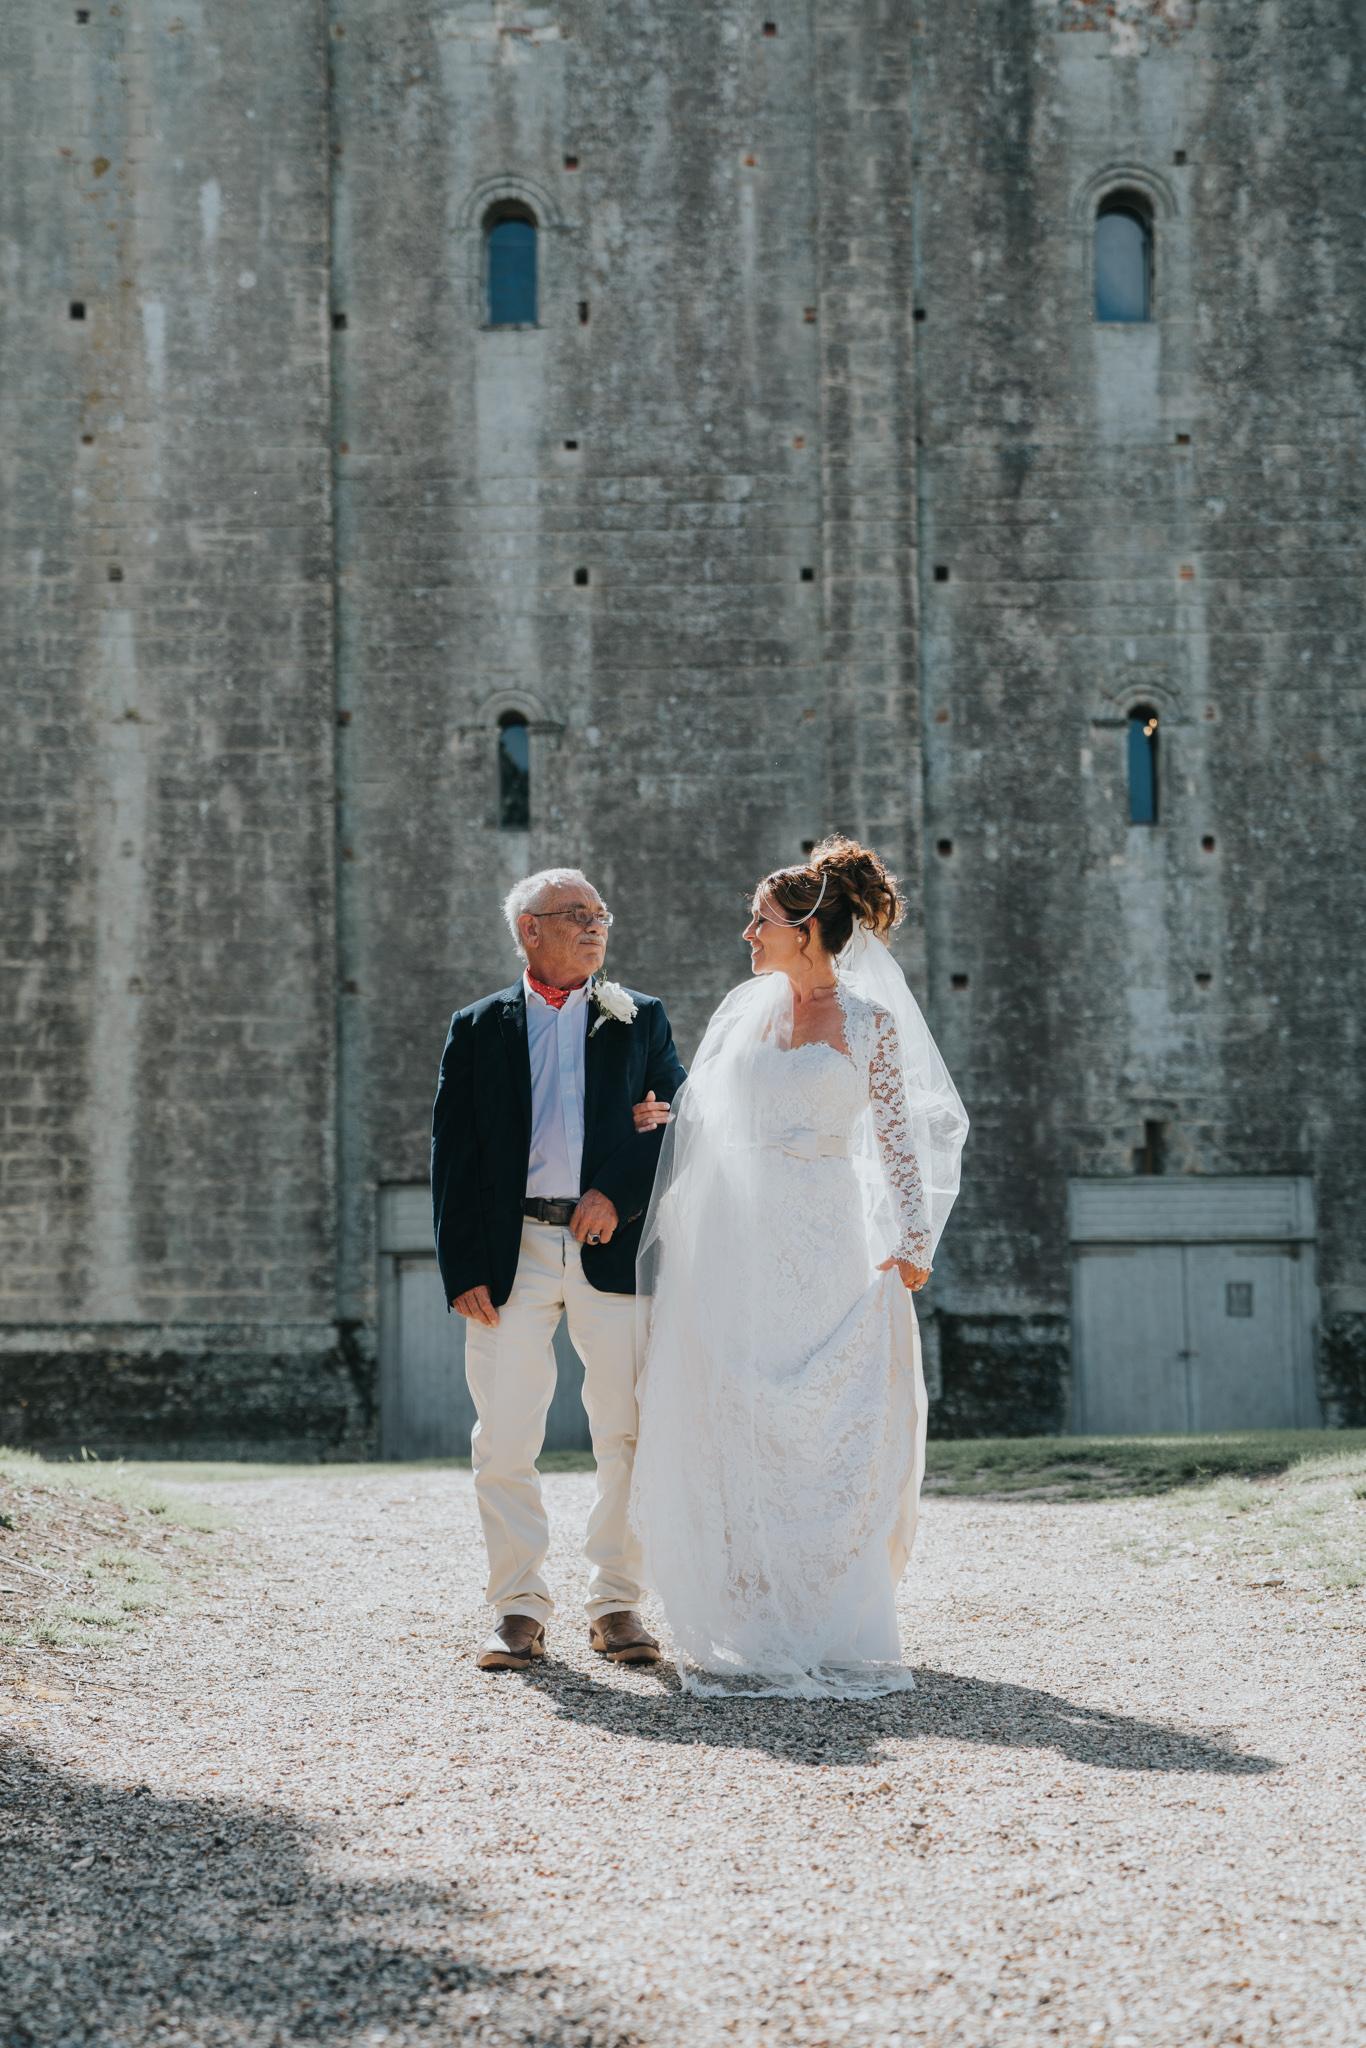 grace-elizabeth-boho-wedding-headingham-castle-essex-wedding-photographer-20.jpg